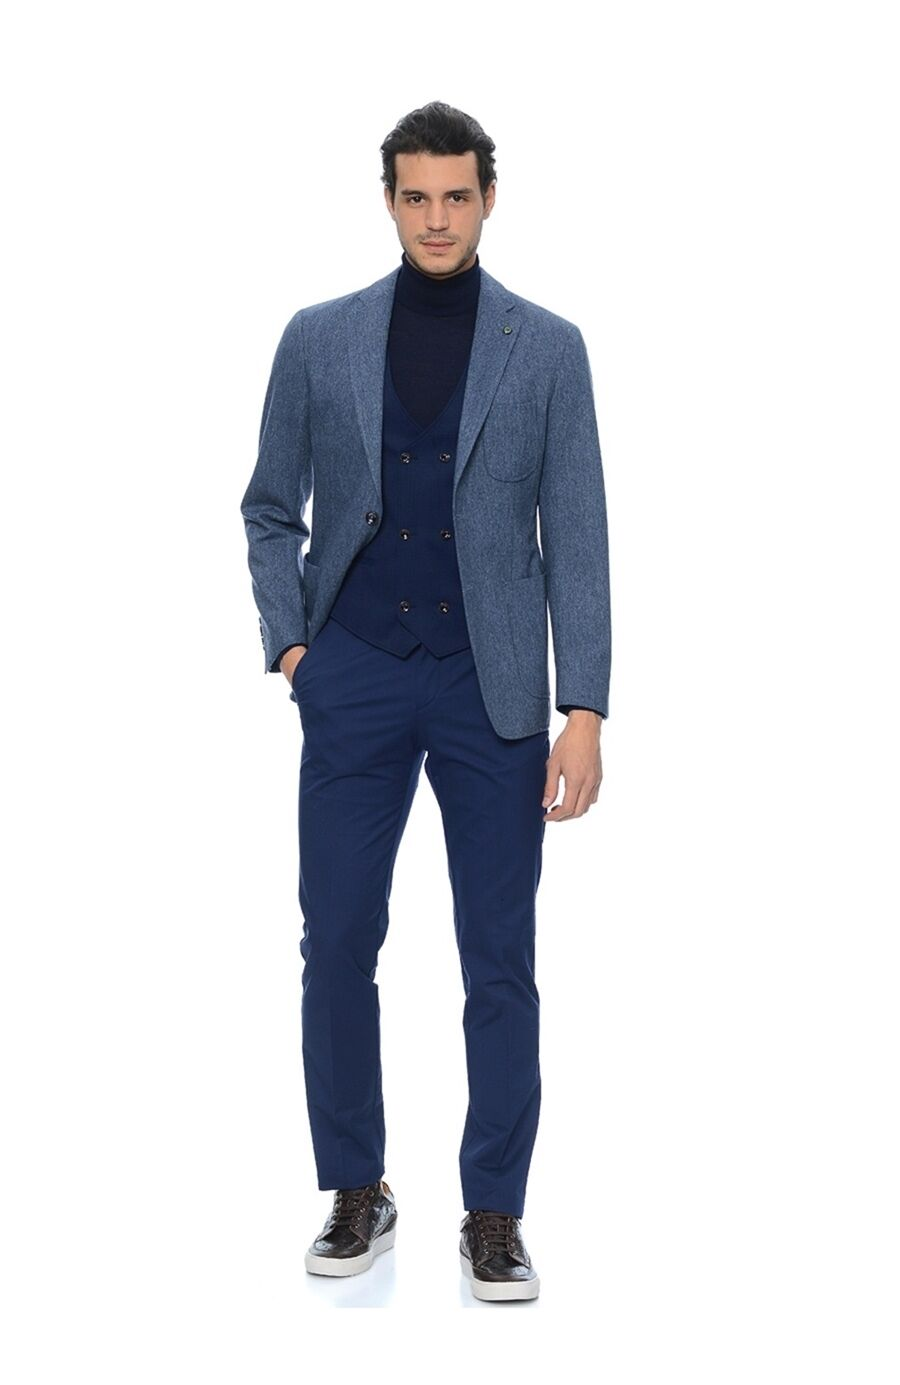 c2e8ab6644f5f Desenli Slım Fit Indigo Yeleklı Takım Elbise - 30029